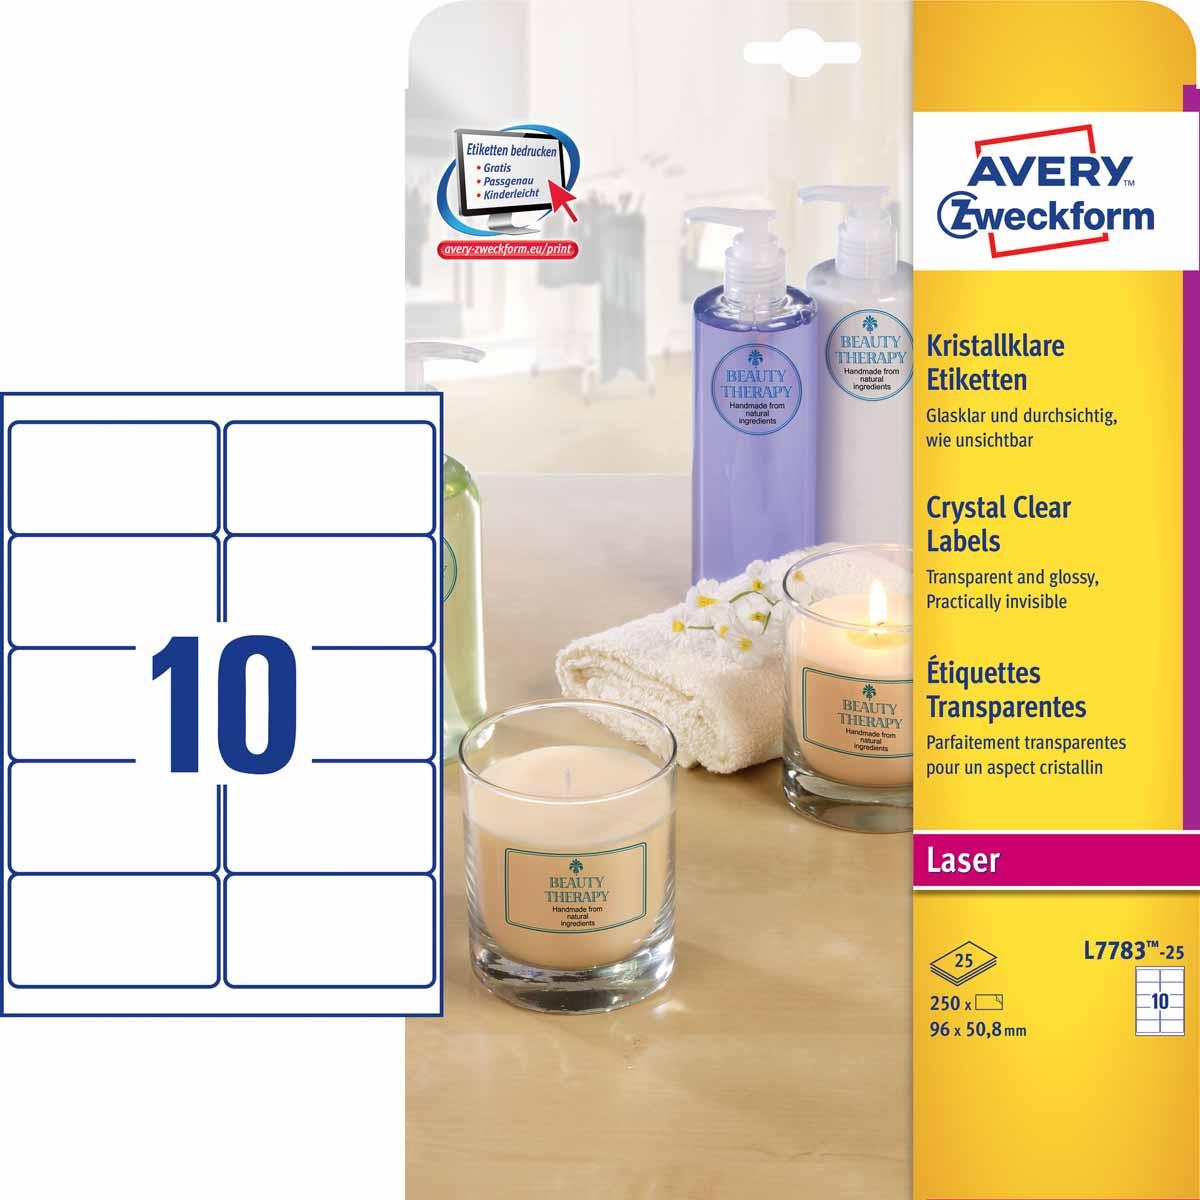 Avery Zweckform Этикетки специальные CRYSTAL CLEAR 96 х 50,8 мм 25 листов